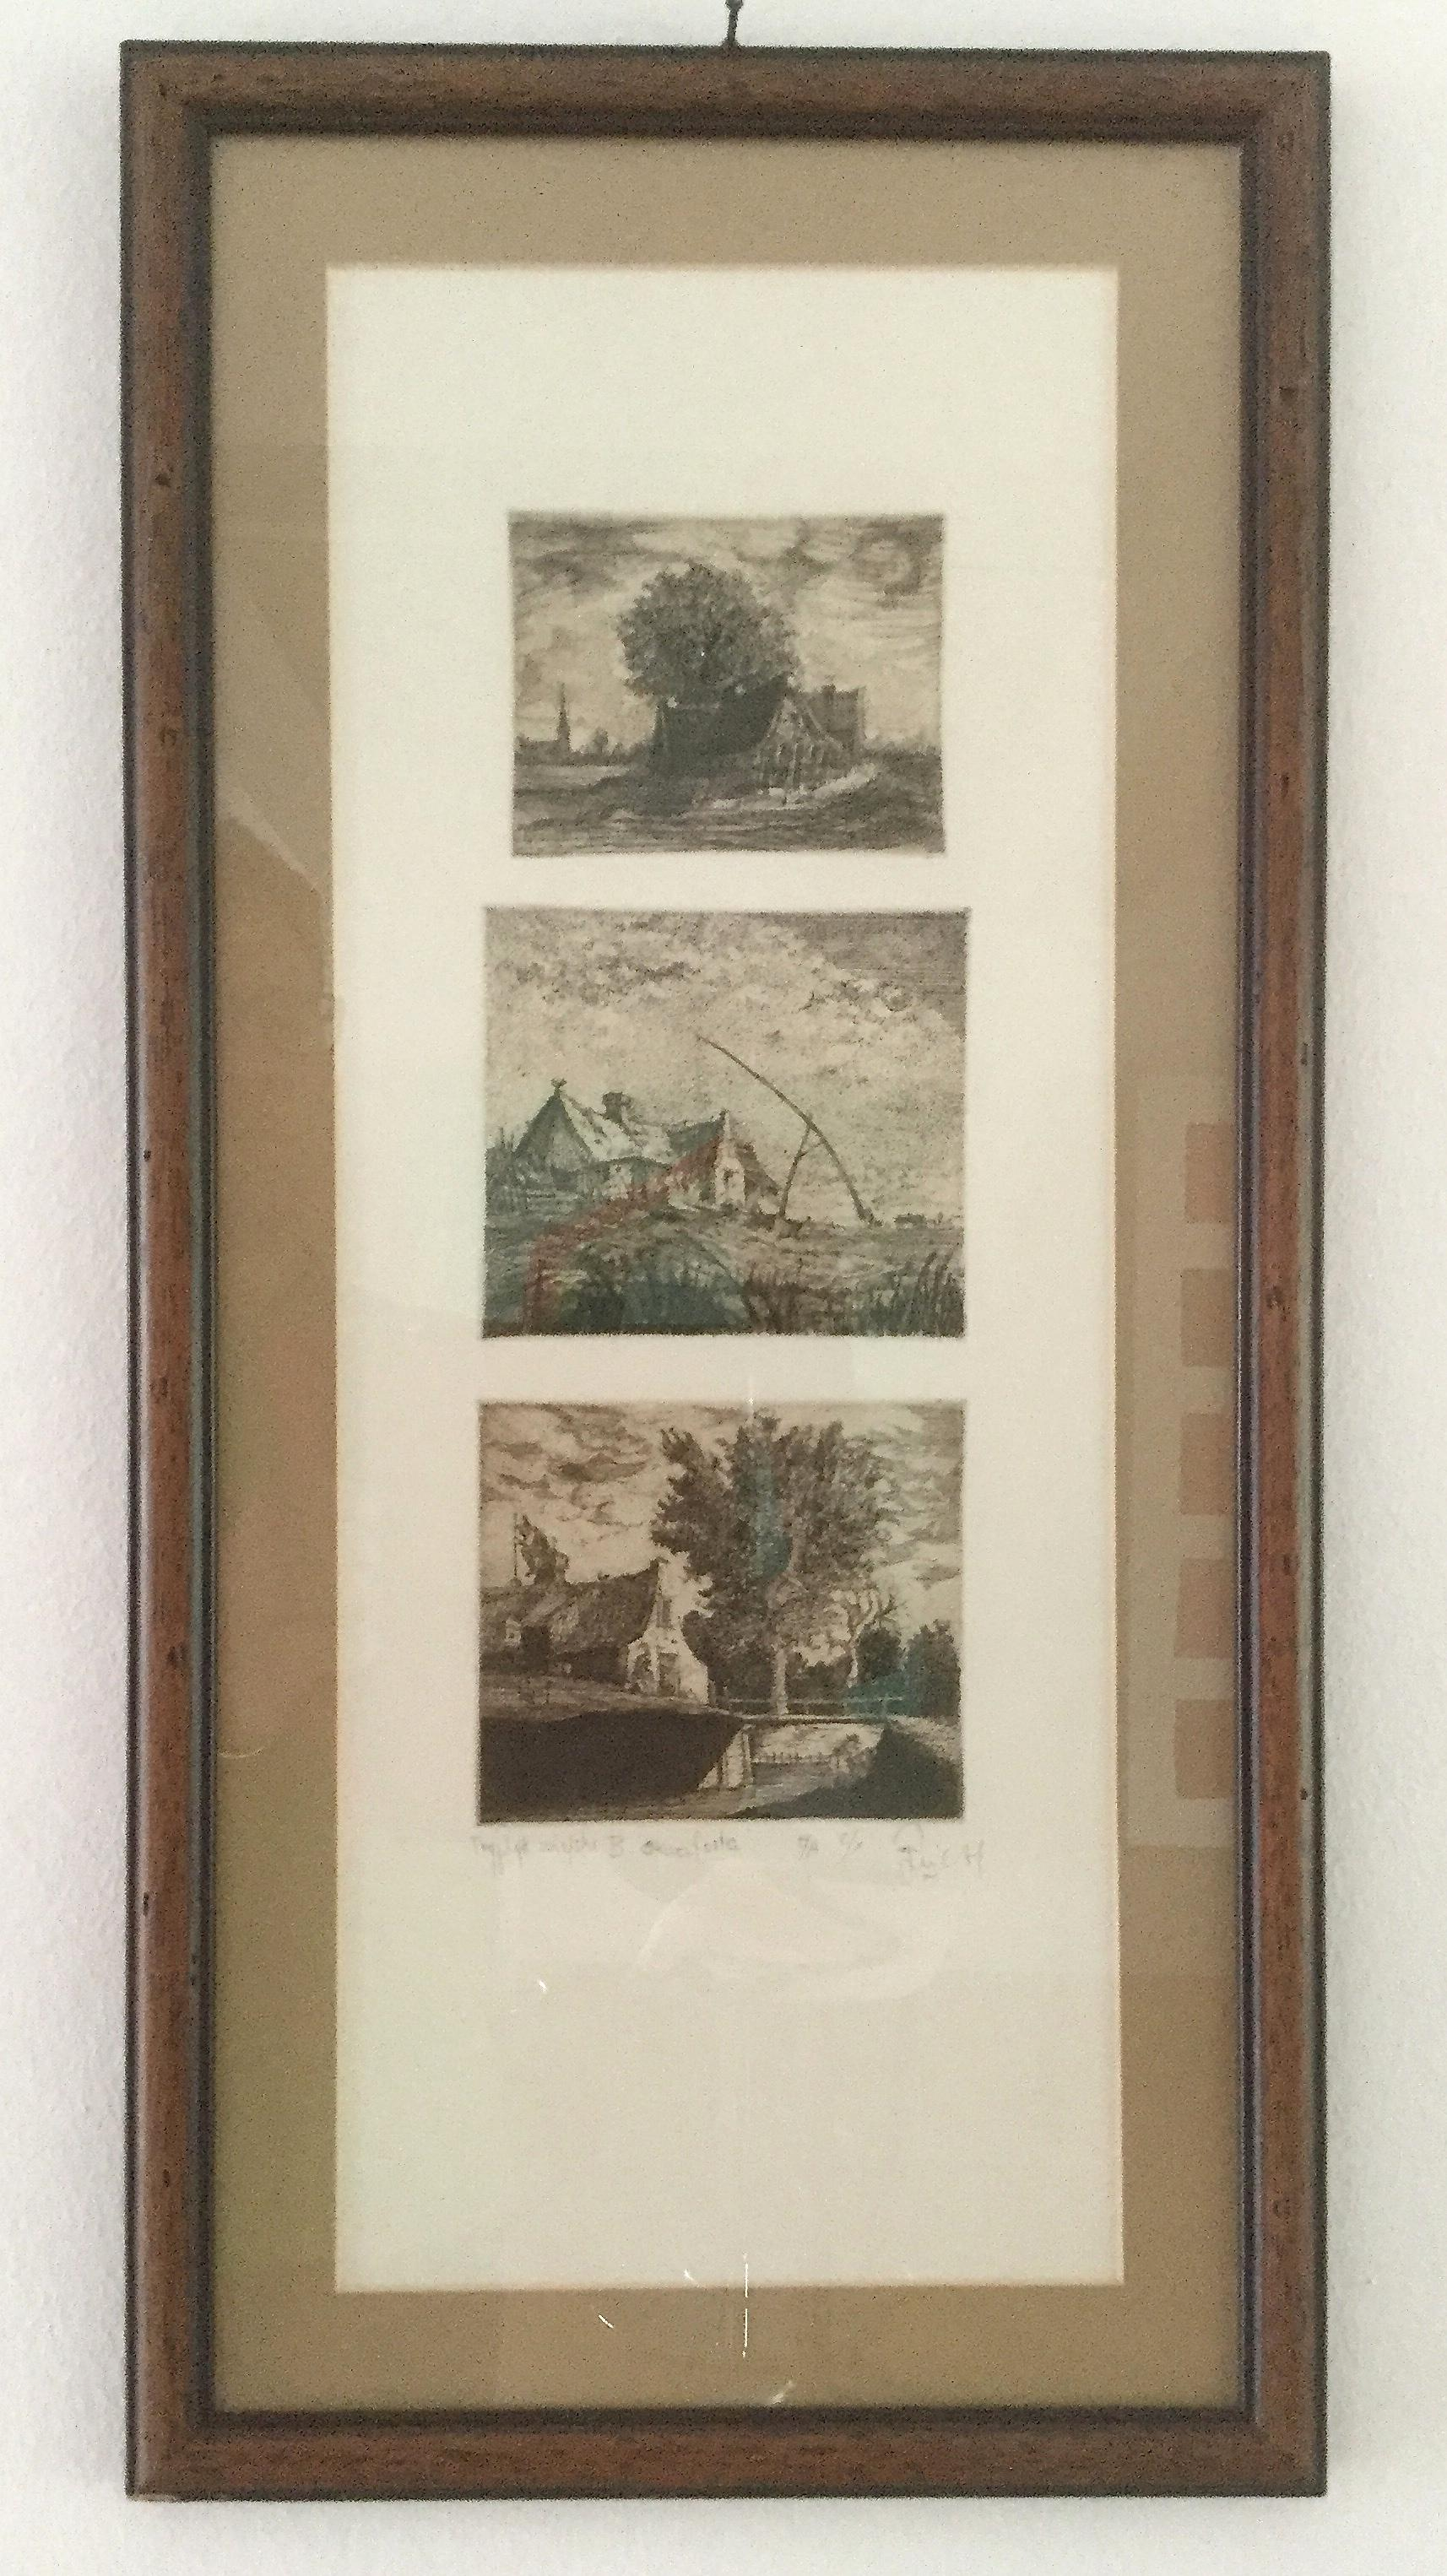 Village Triptych - XX century, Figurative Etching Print, very small edition 2/X